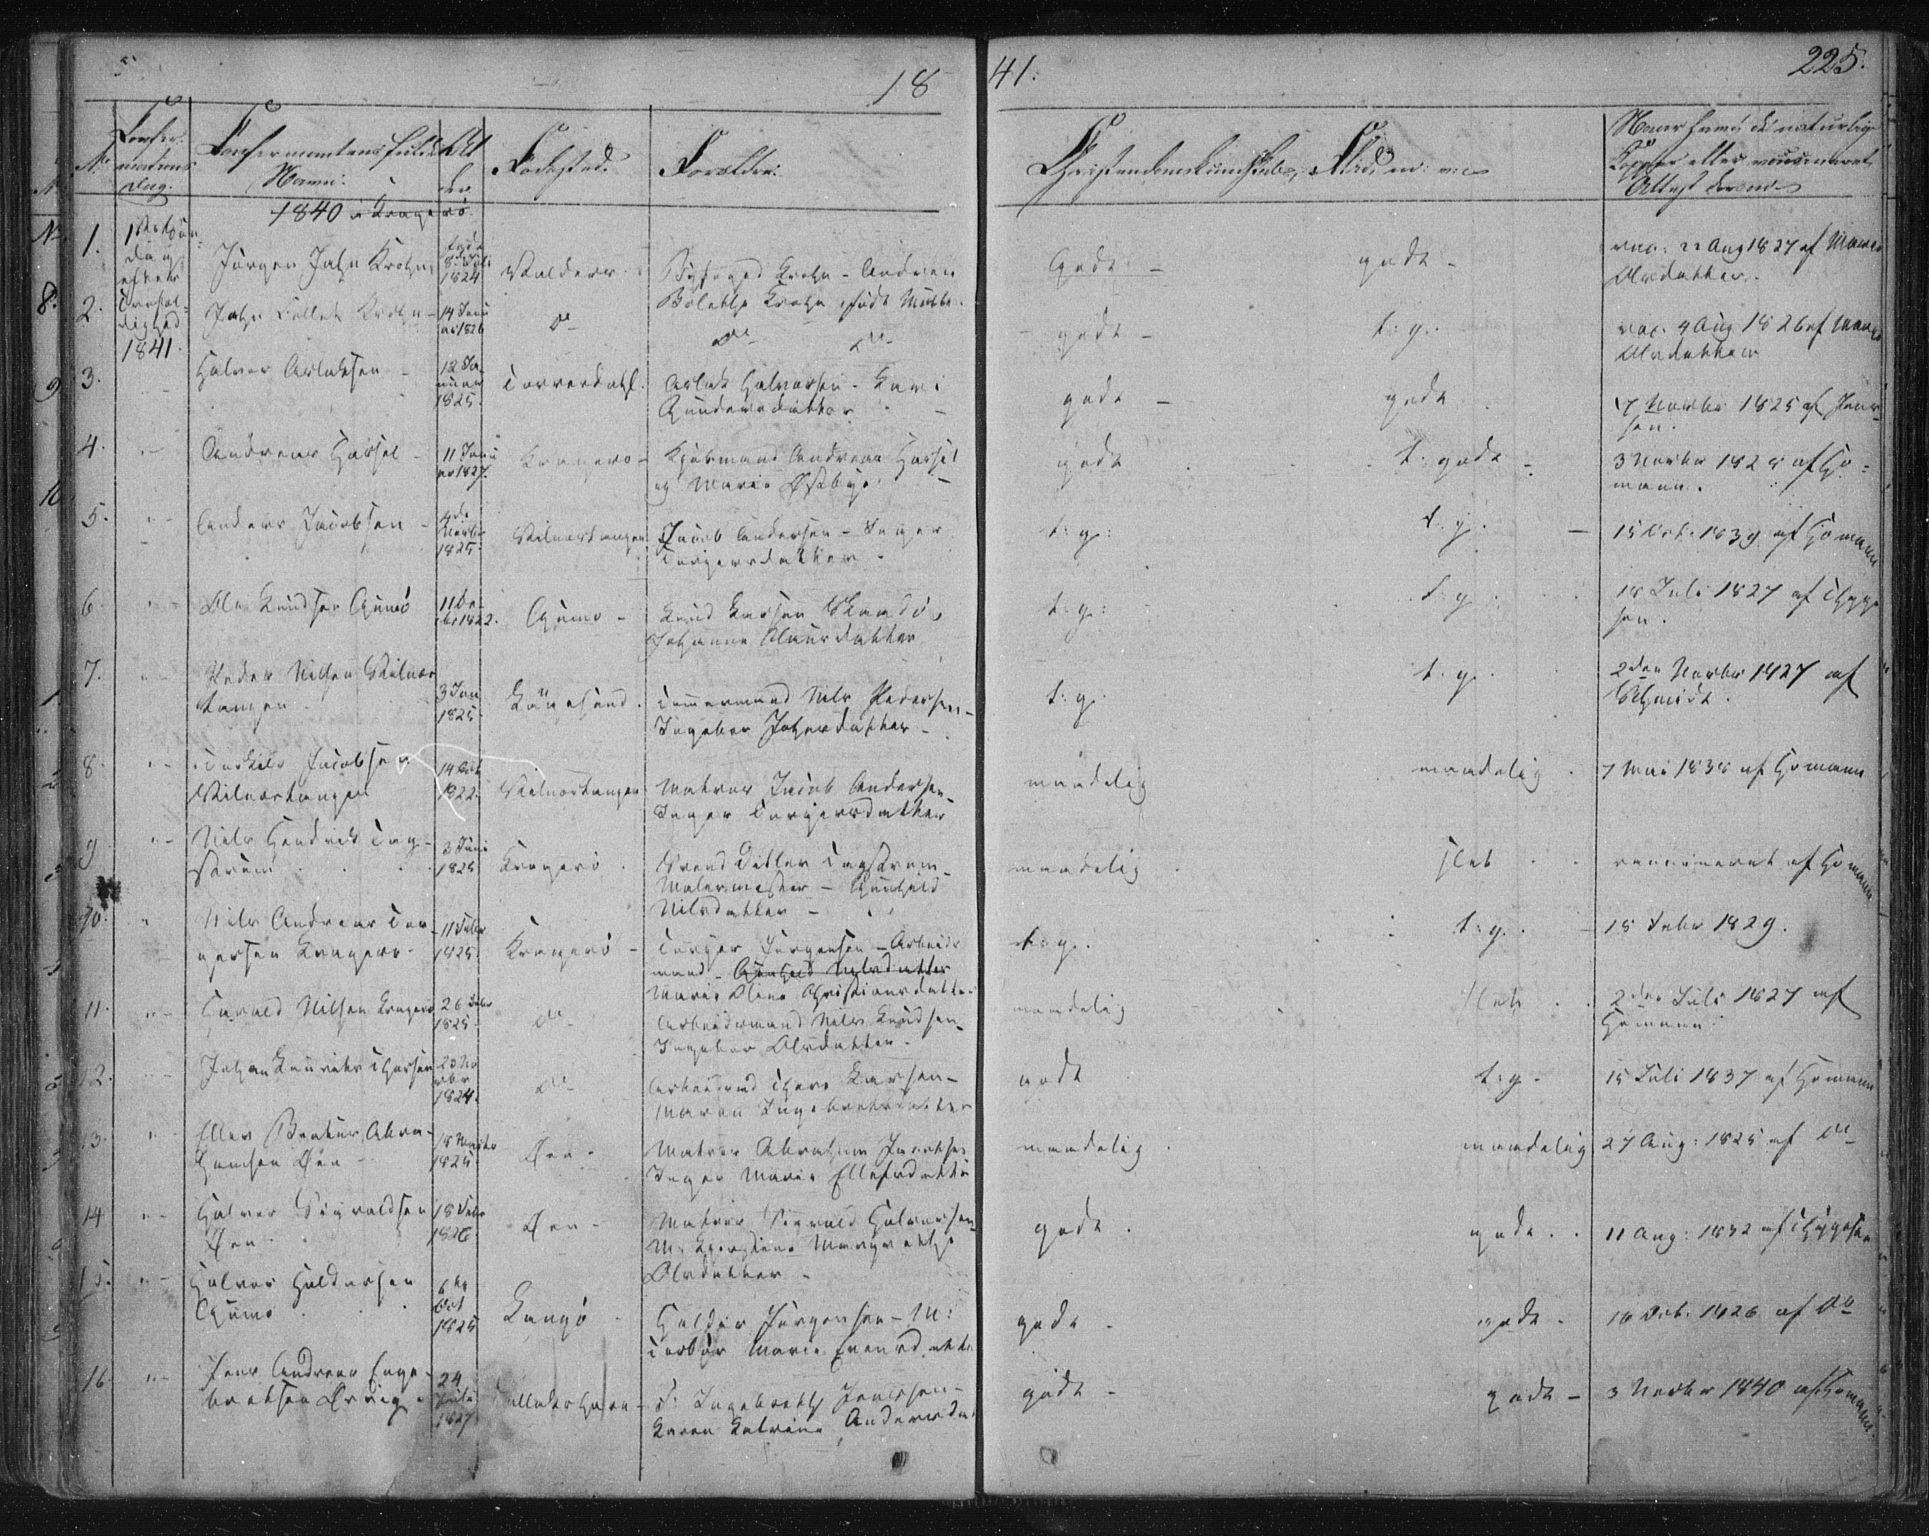 SAKO, Kragerø kirkebøker, F/Fa/L0005: Ministerialbok nr. 5, 1832-1847, s. 225